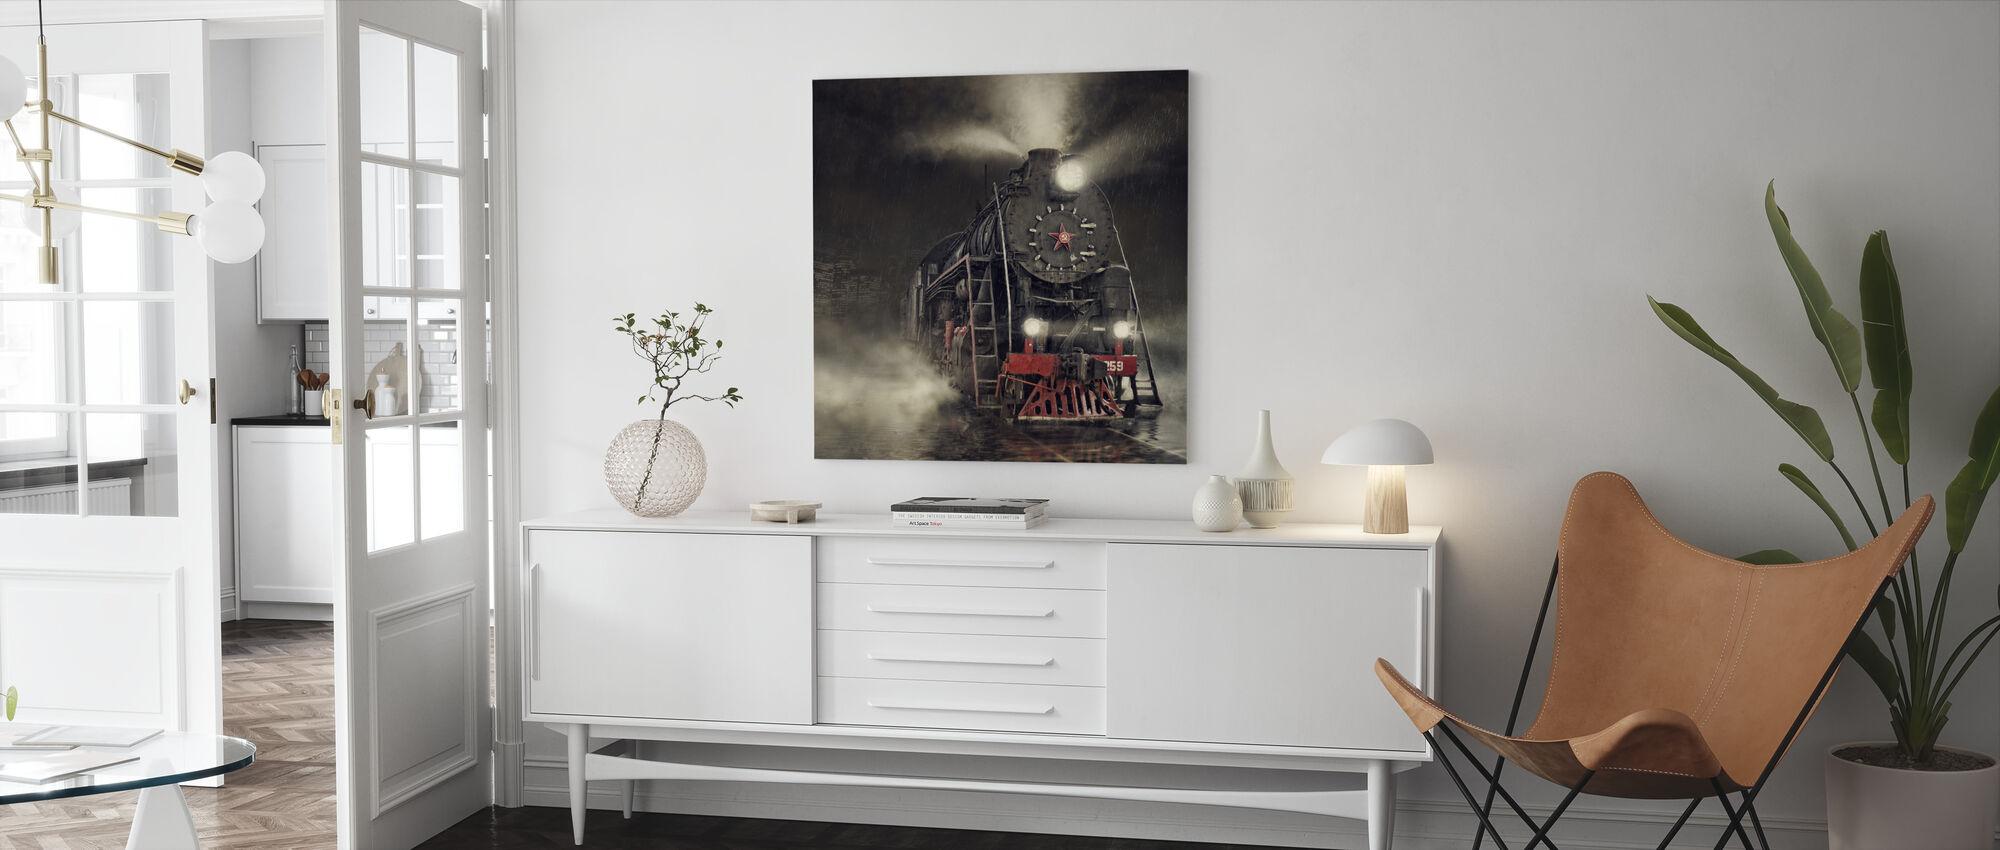 Train in the Rain - Canvas print - Living Room